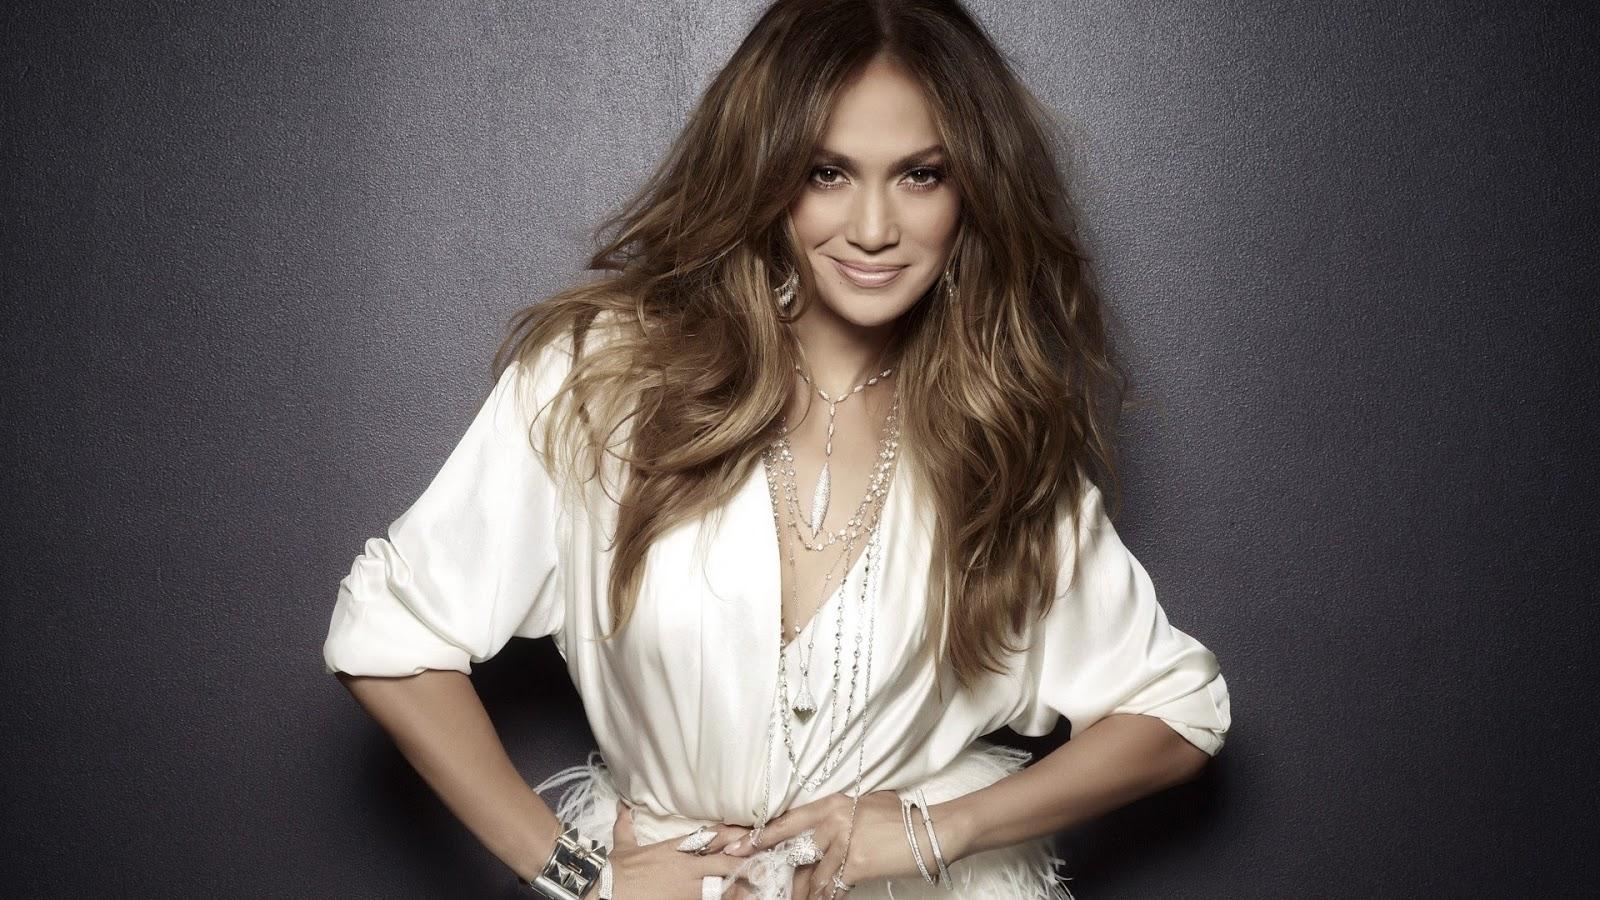 http://4.bp.blogspot.com/-5NOTcpI2kOU/UVxsfU8TlJI/AAAAAAAAB04/Yt5C1DR83Cc/s1600/Jennifer-Lopez-2013-HD-Wallpaper.jpg